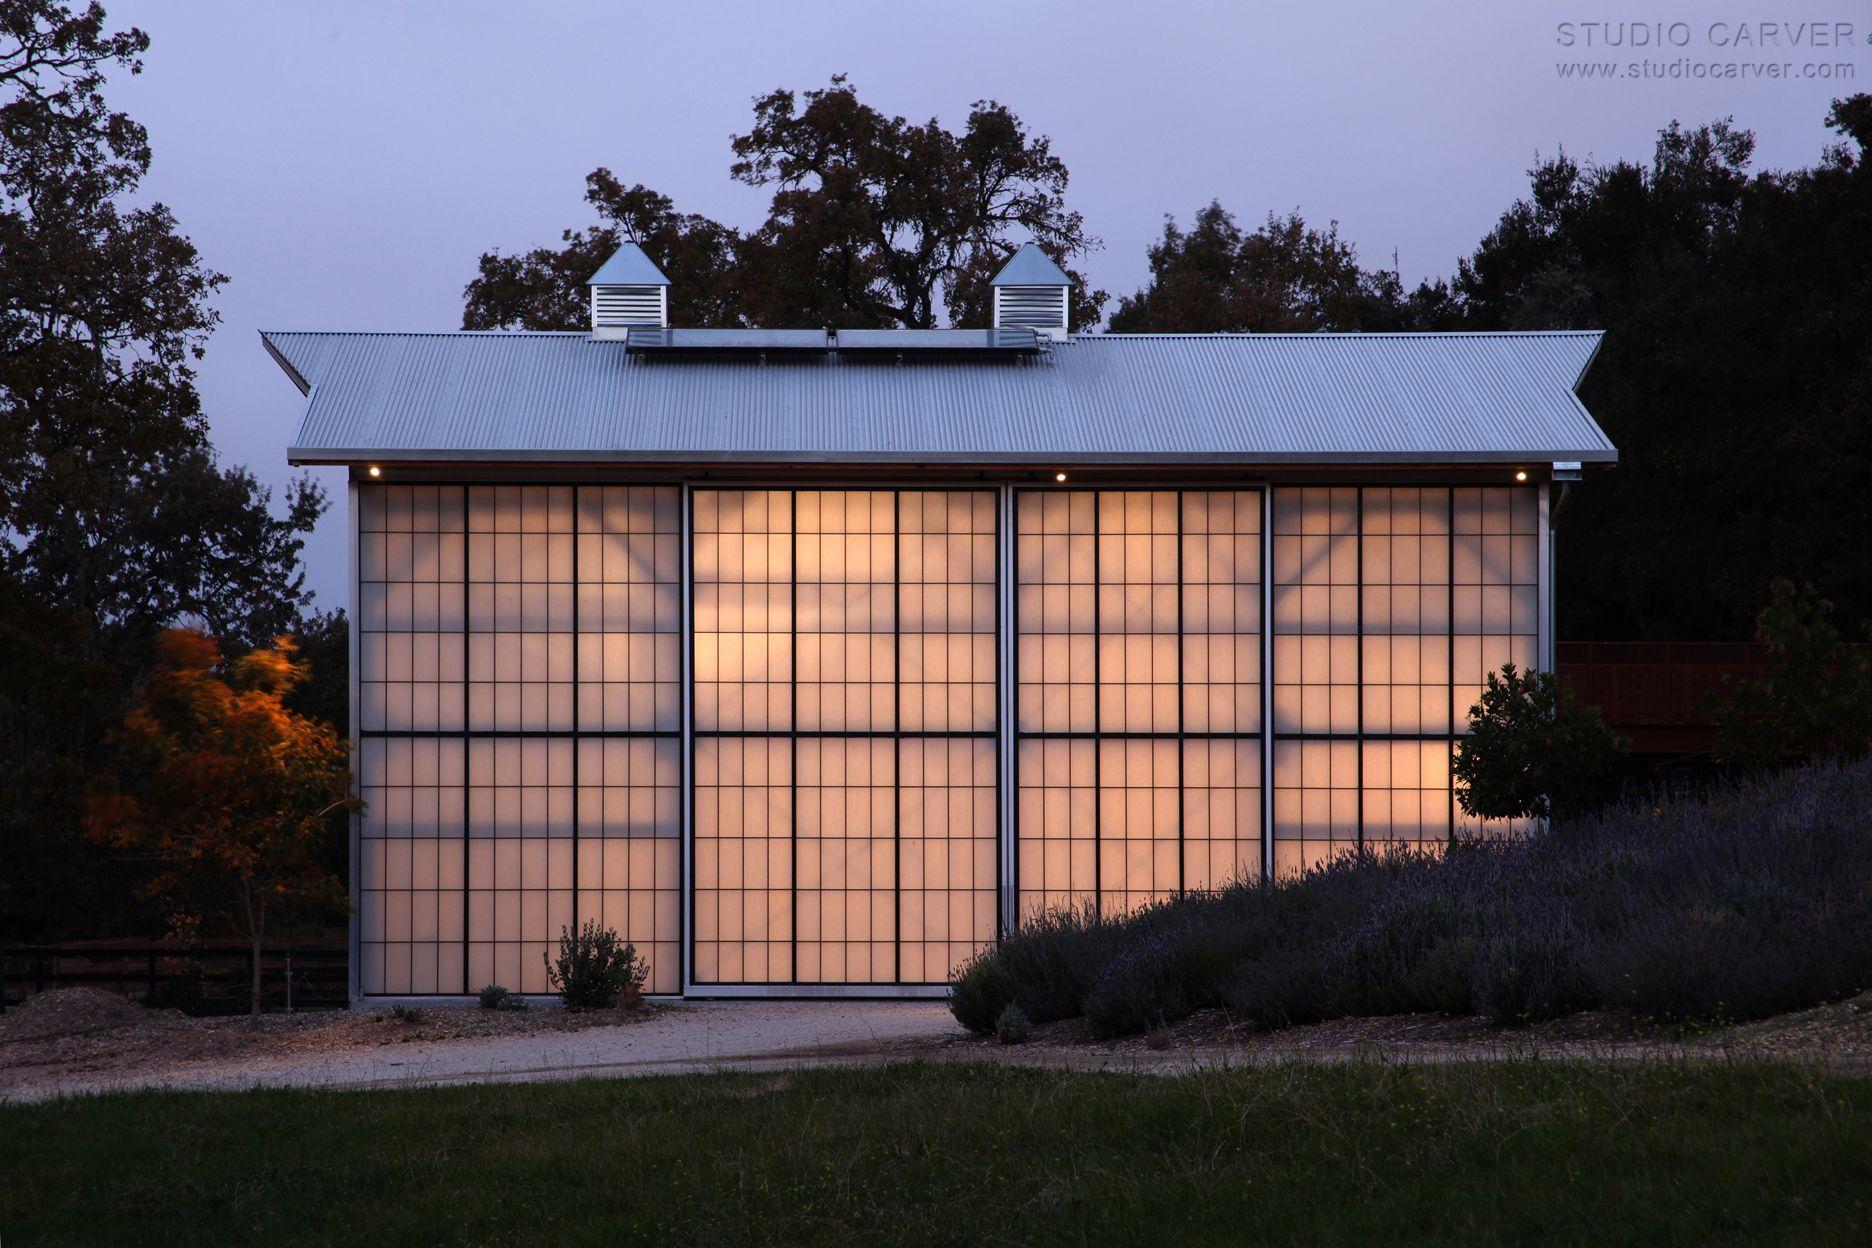 Santa Ynez Barn U003e STUDIO CARVER Santa Ynez, California Good Ideas